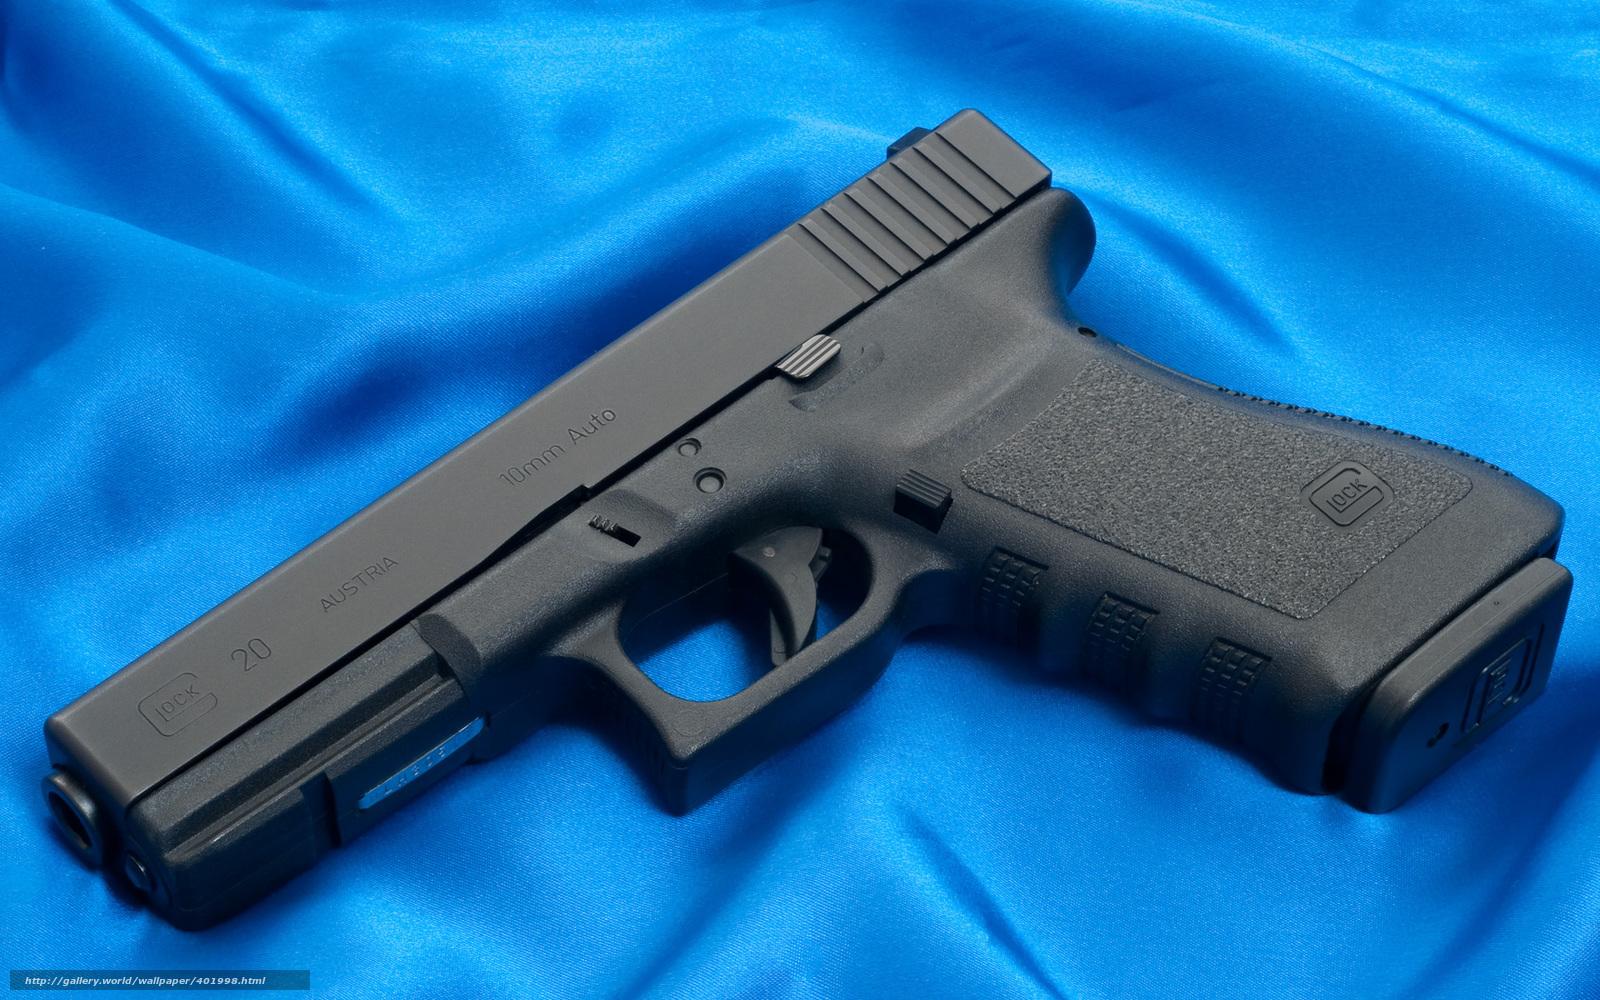 Download wallpaper Glock, gun, weapon